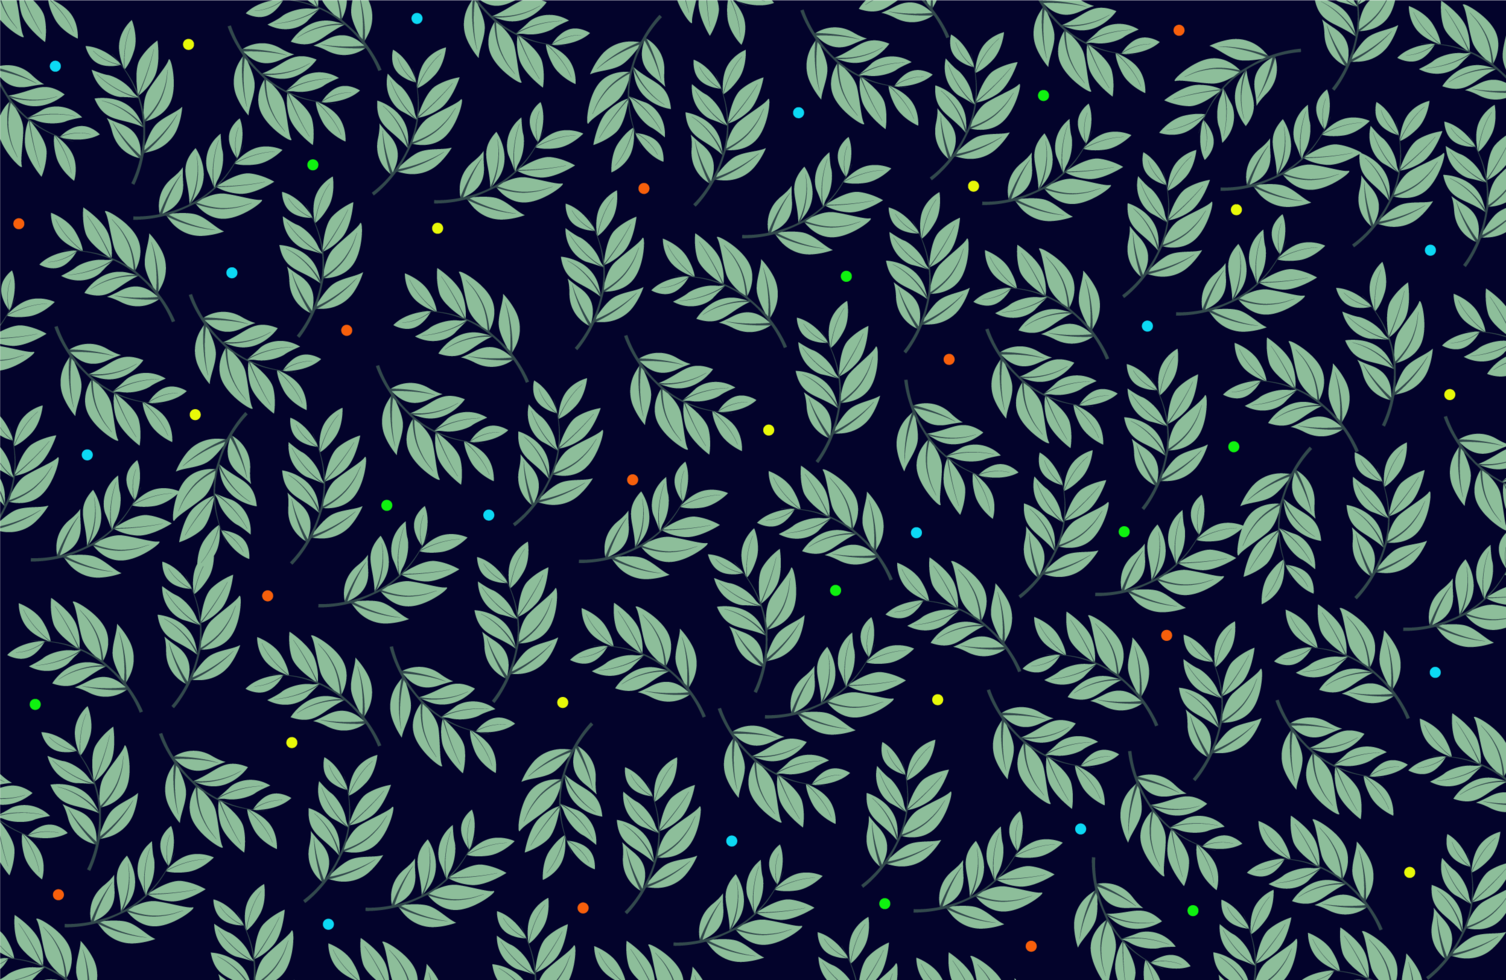 Blätter und bunte Punkte Stoffmuster vektor